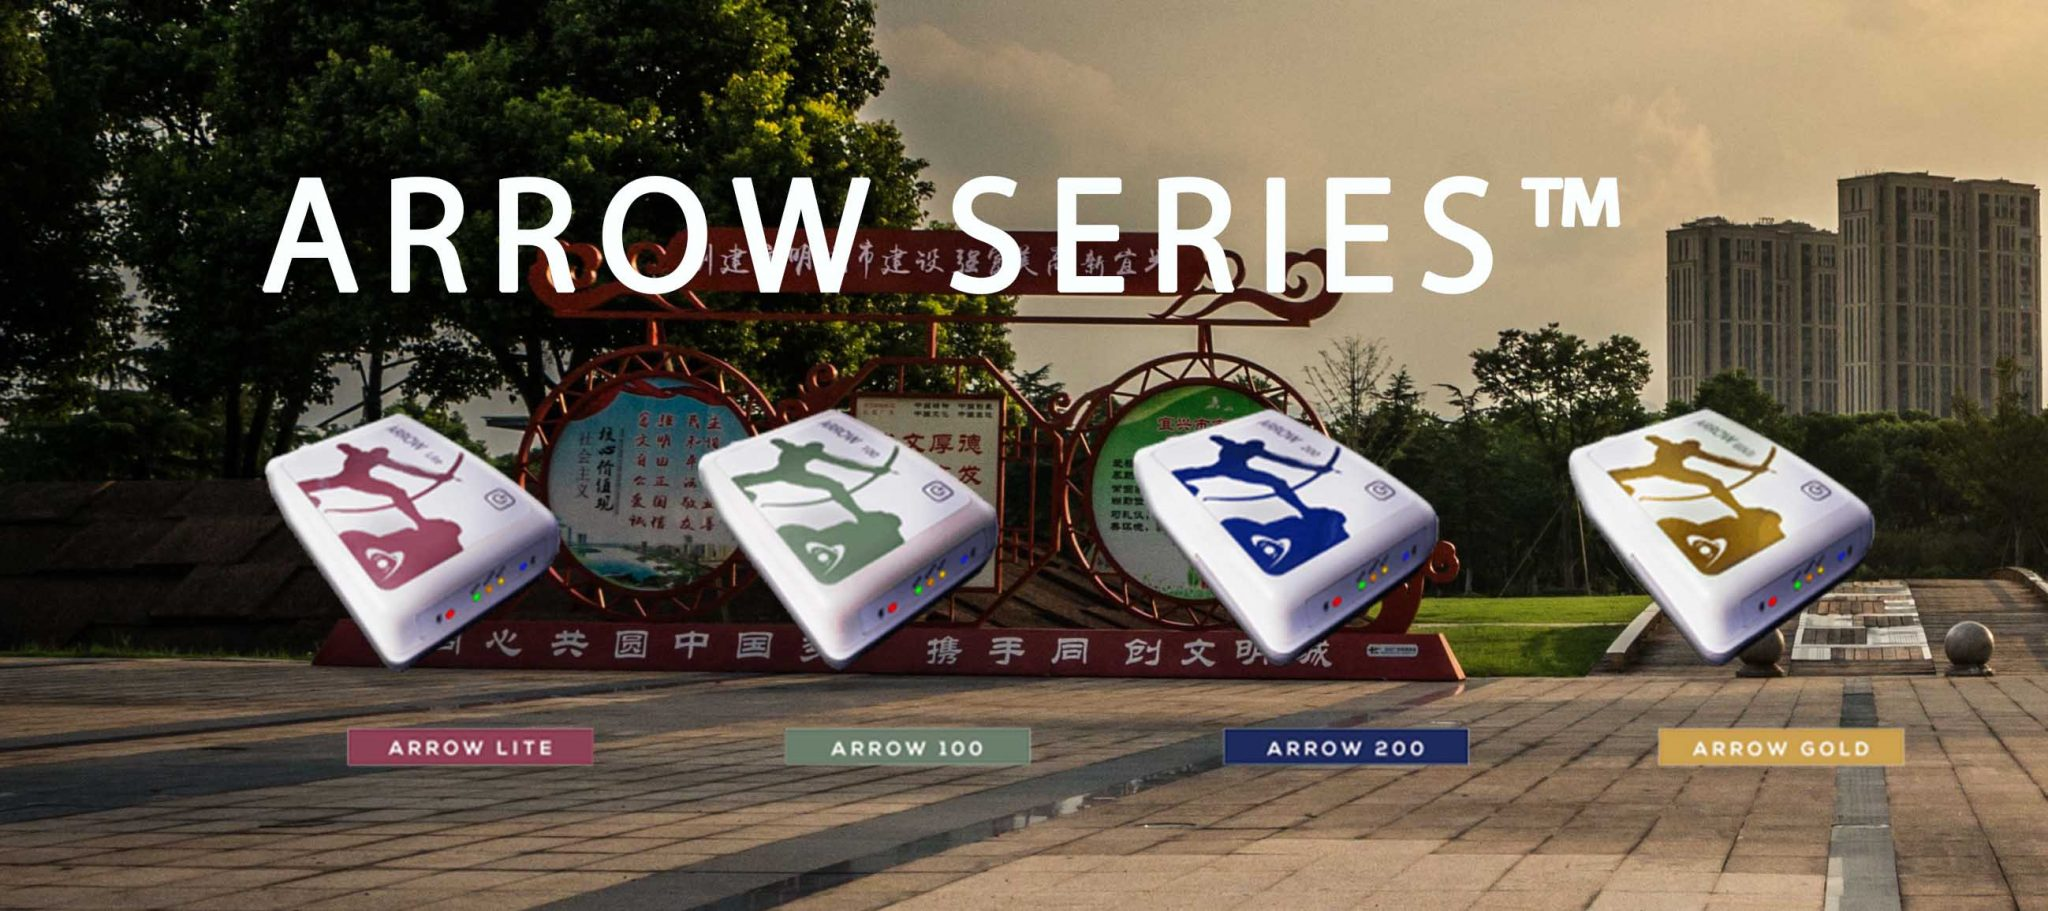 1-Arrow-Series-Sm 2